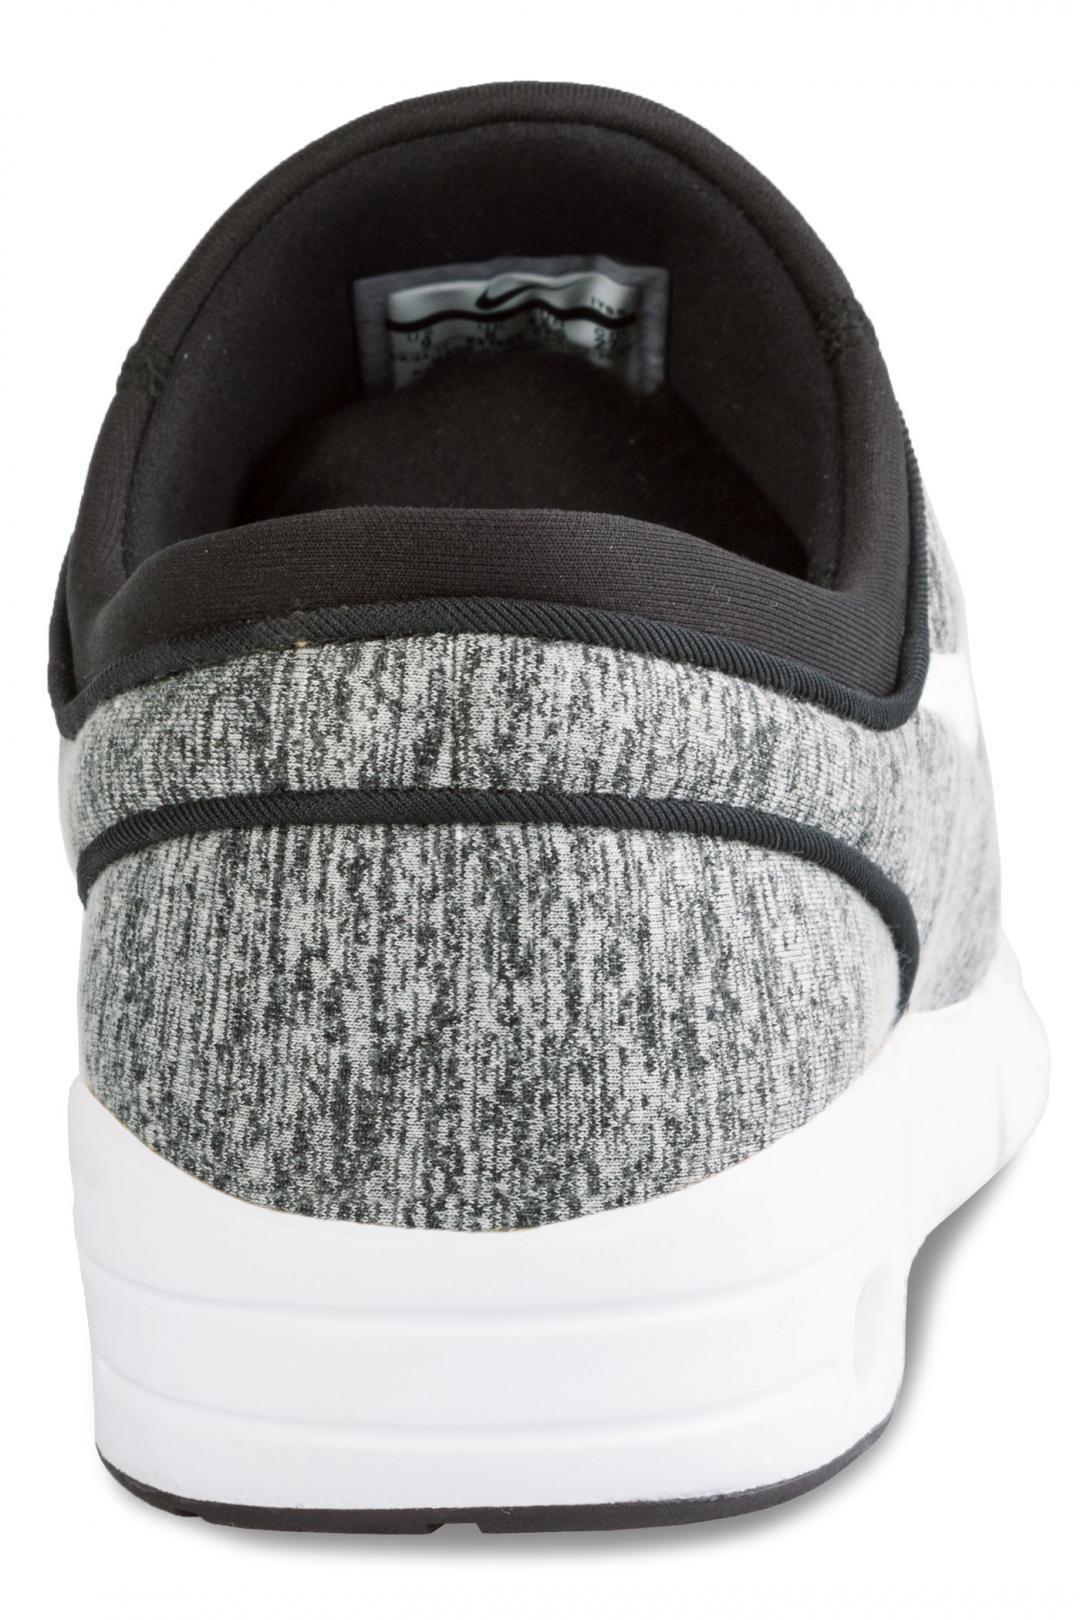 Uomo Nike SB Stefan Janoski Max black white grey | Sneaker